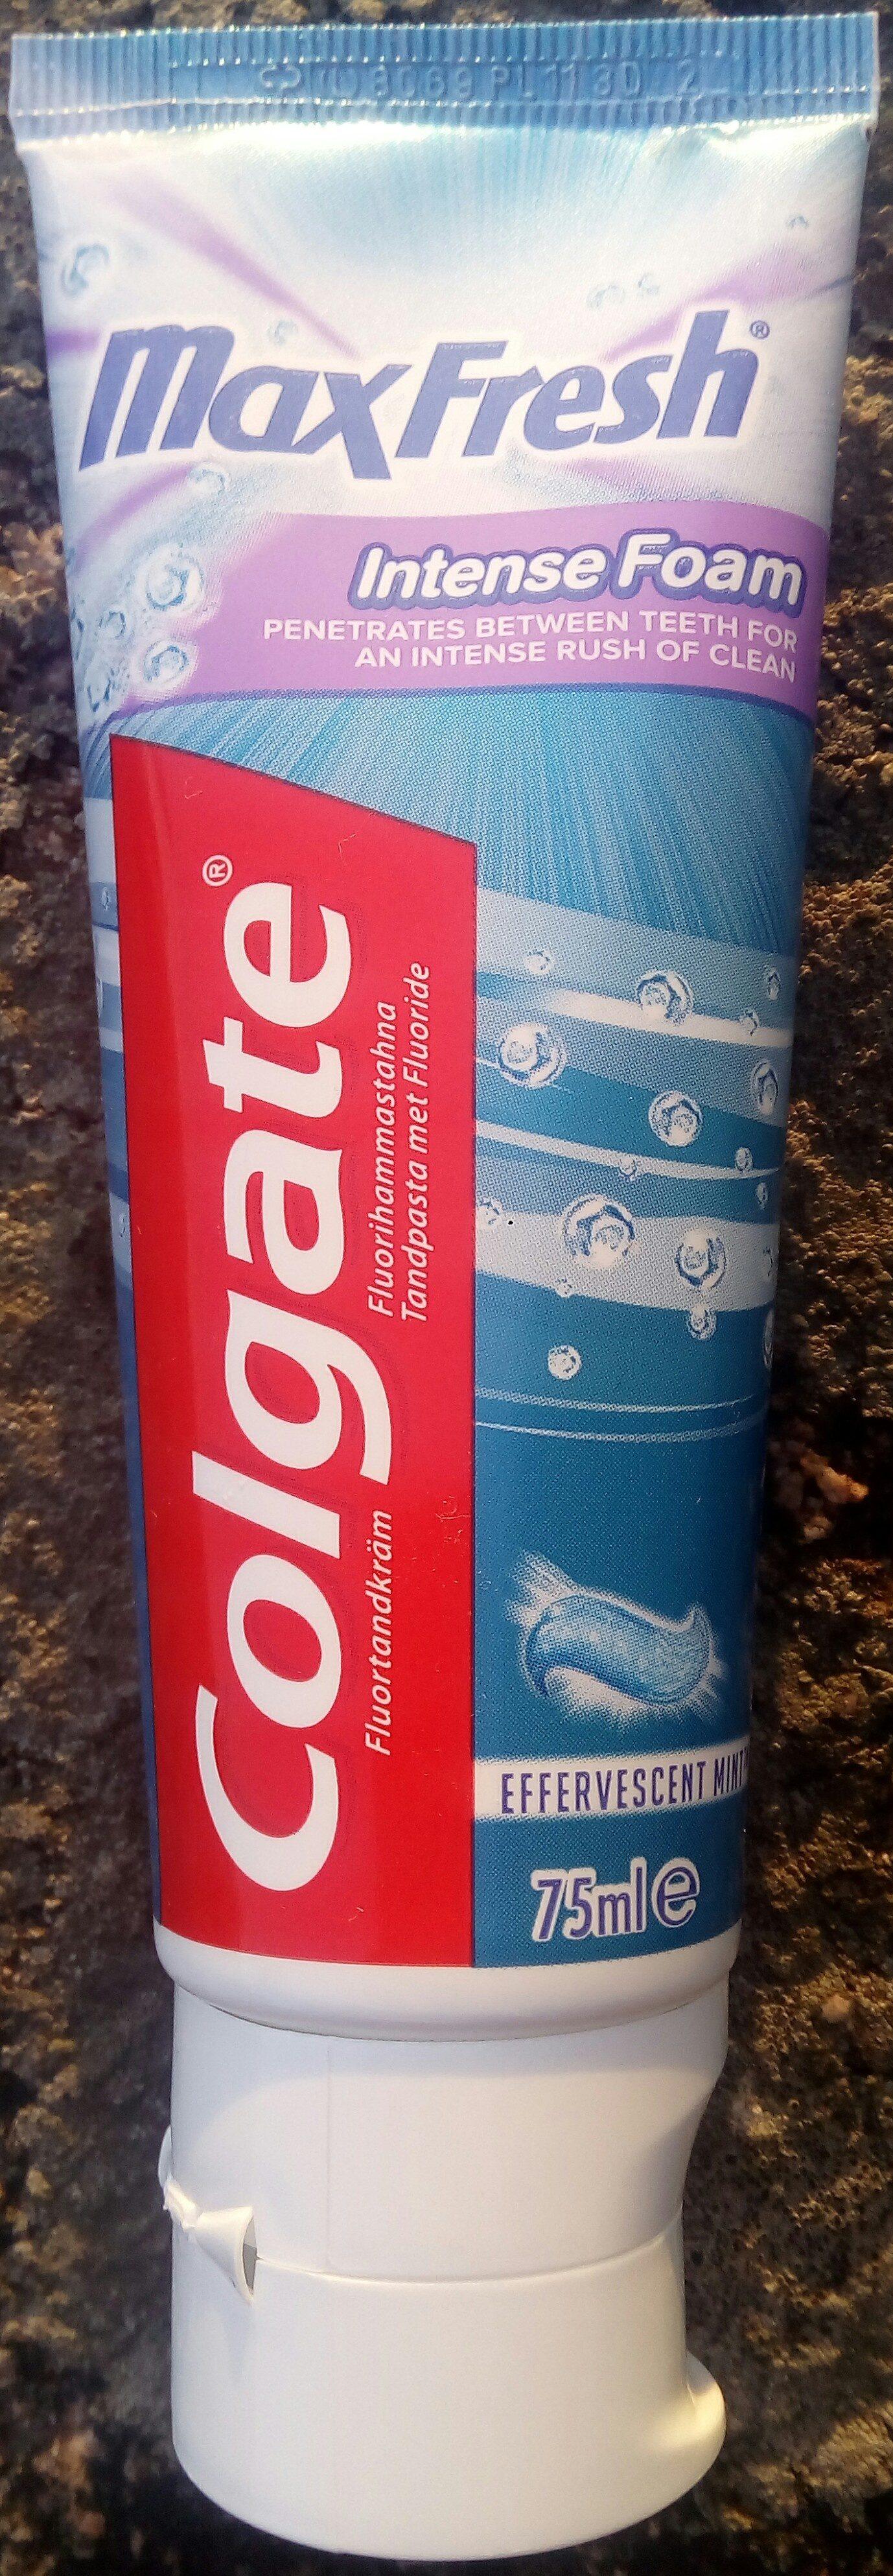 Colgate MaxFresh Intense Foam - Product